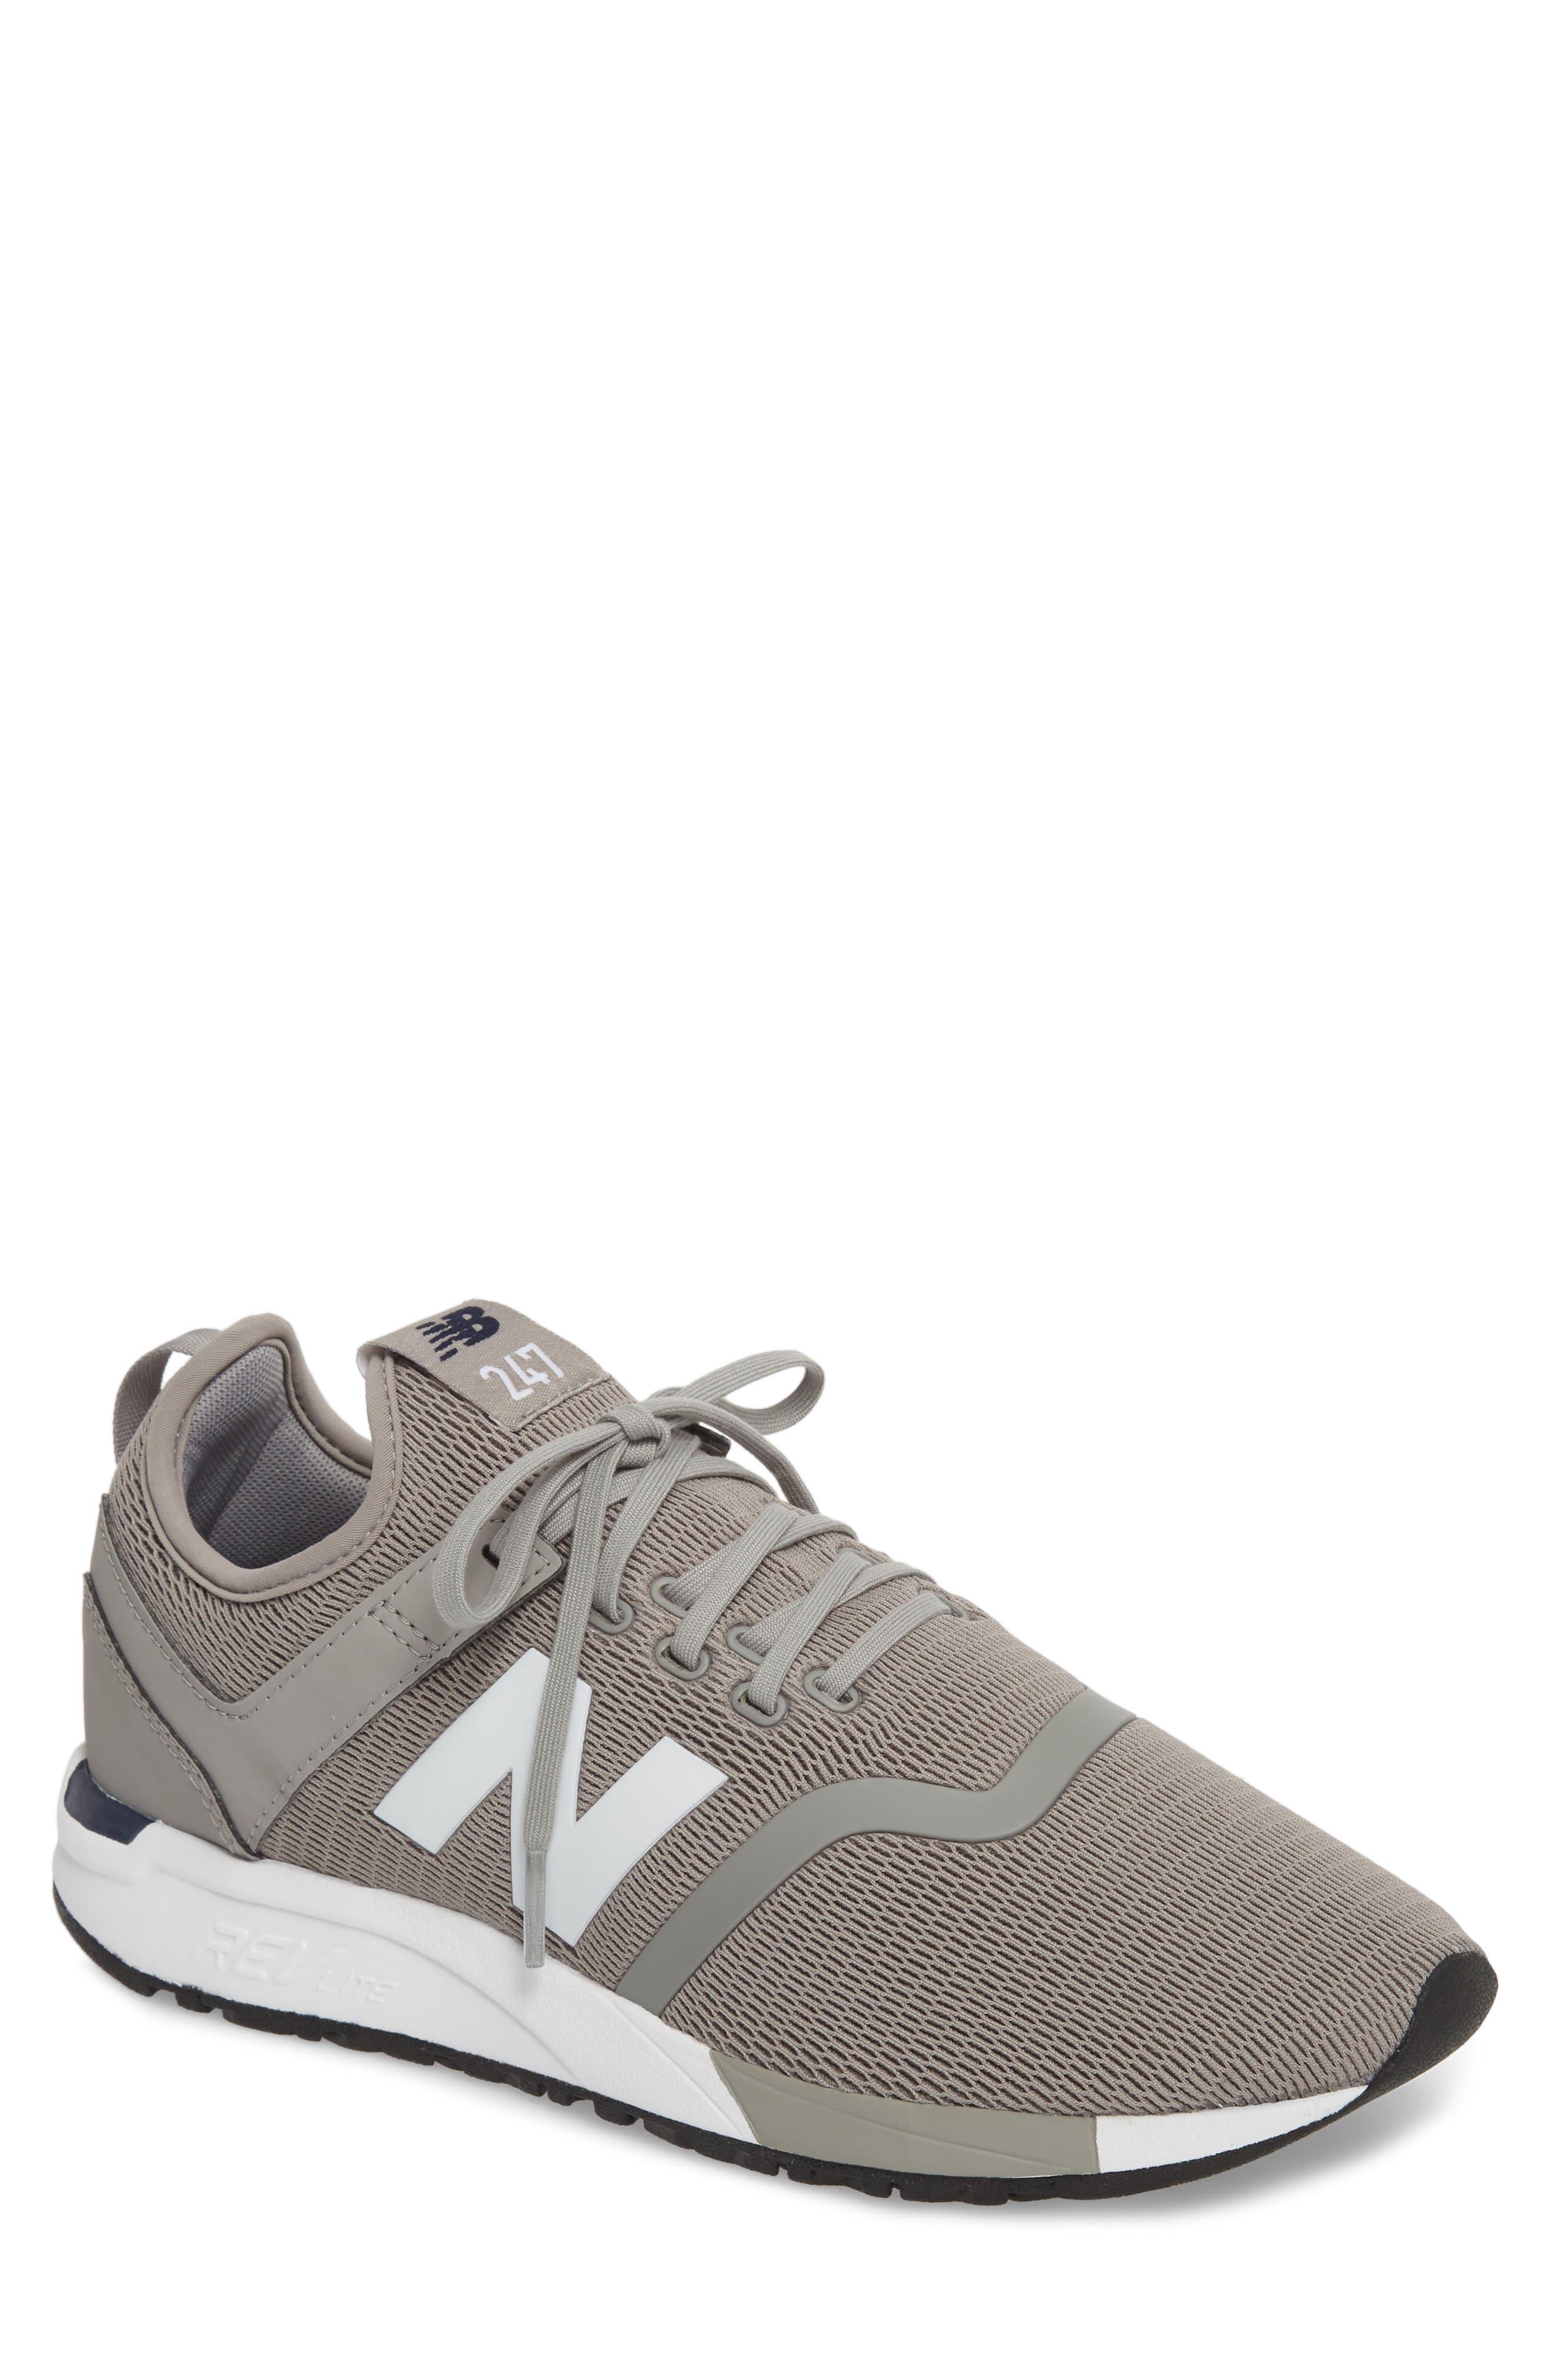 247 Sneaker,                         Main,                         color, Steel